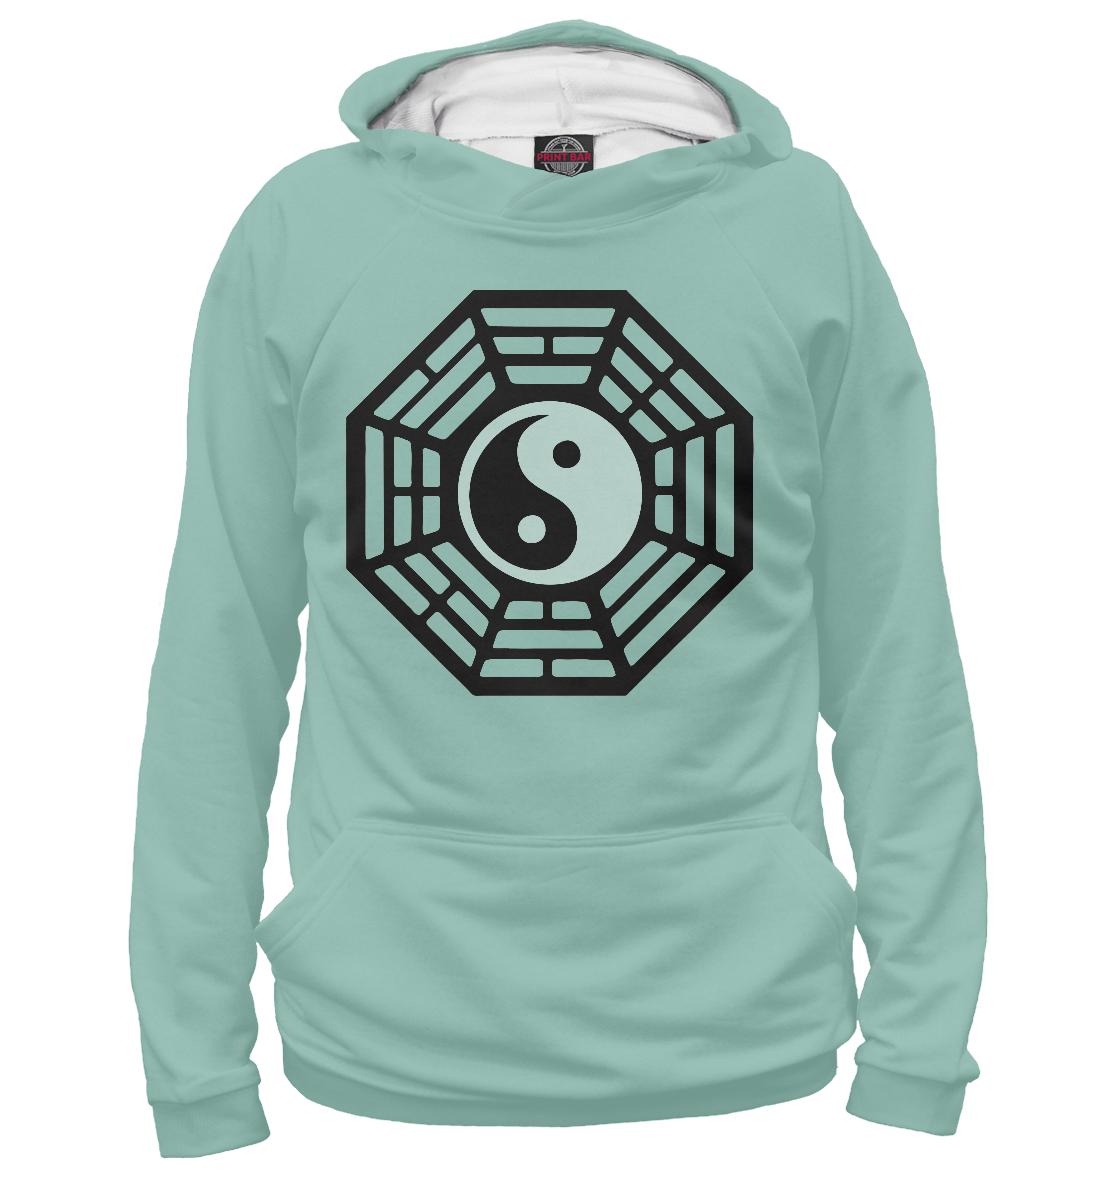 Купить Lost - Dharma Initiative (Blue), Printbar, Худи, APD-420461-hud-1